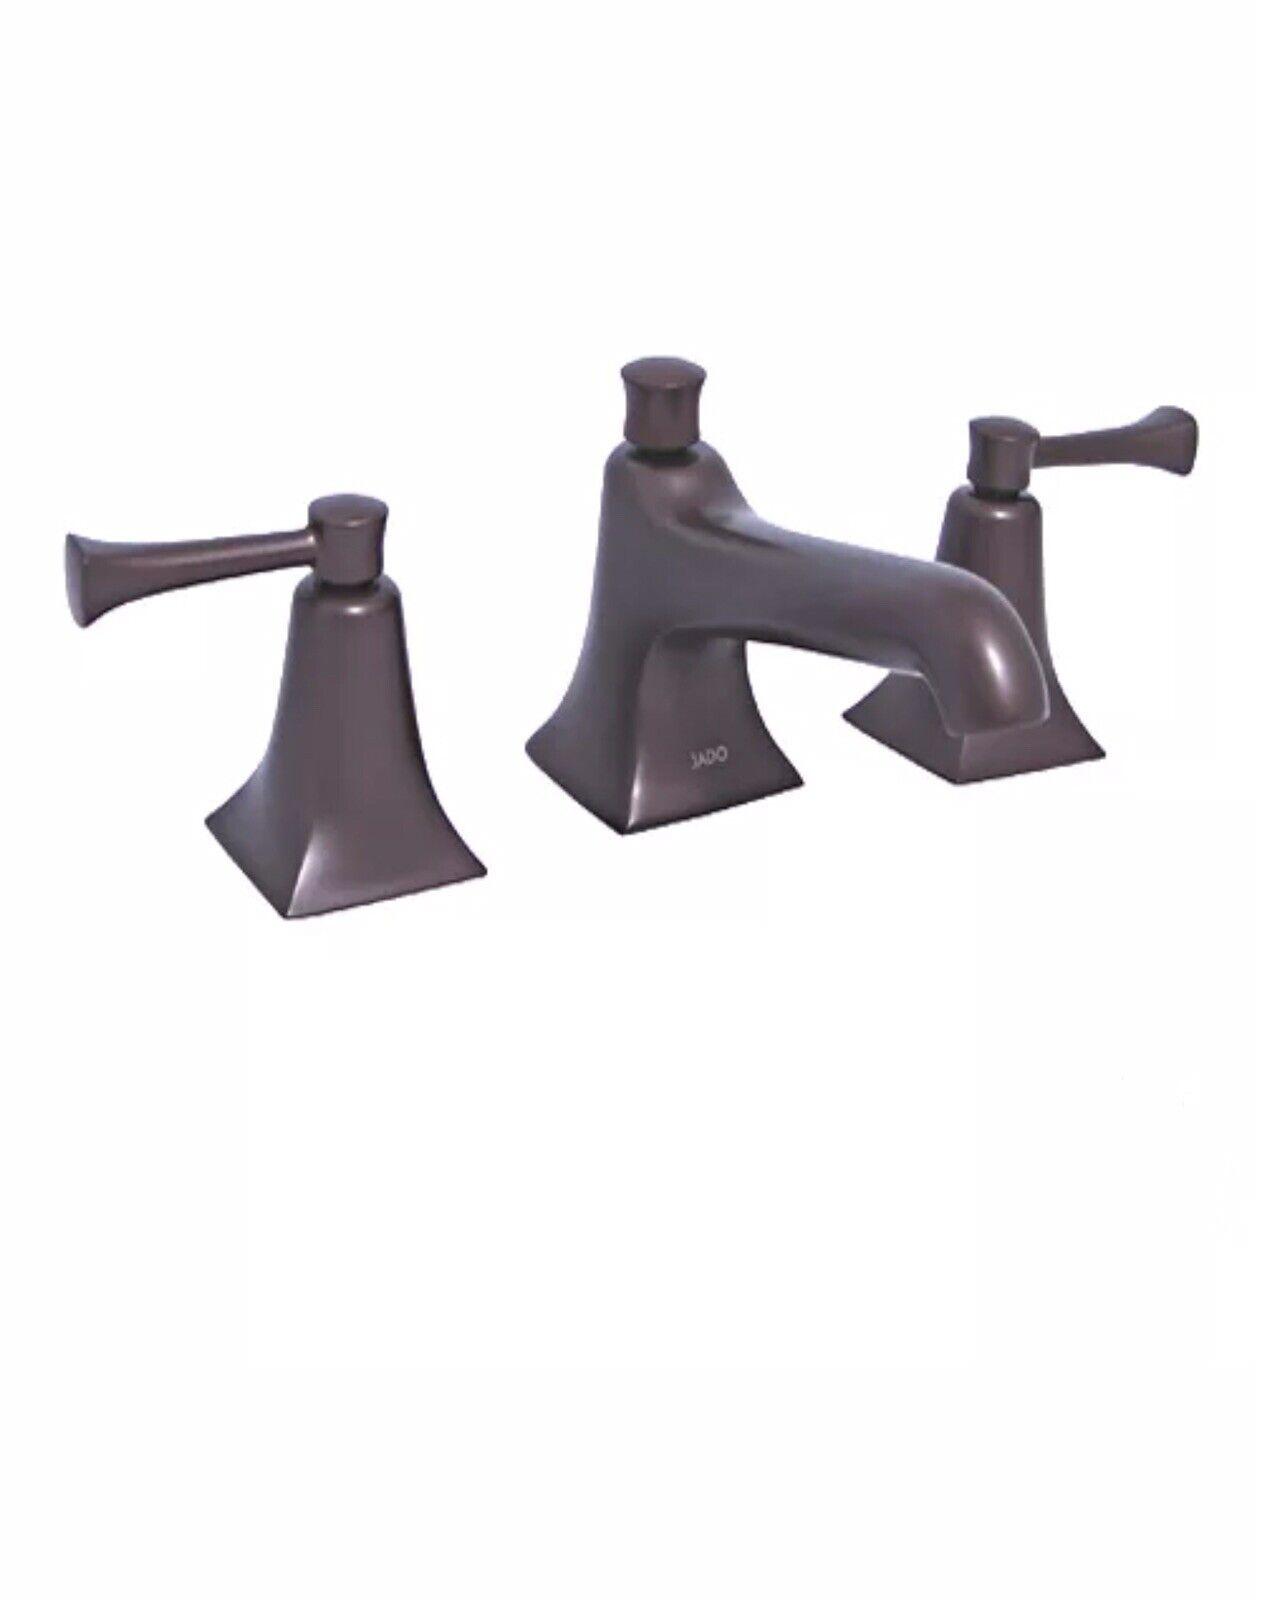 Jado 820003 105 Illume Old Bronze Widespread Bathroom Sink Faucet For Sale Online Ebay